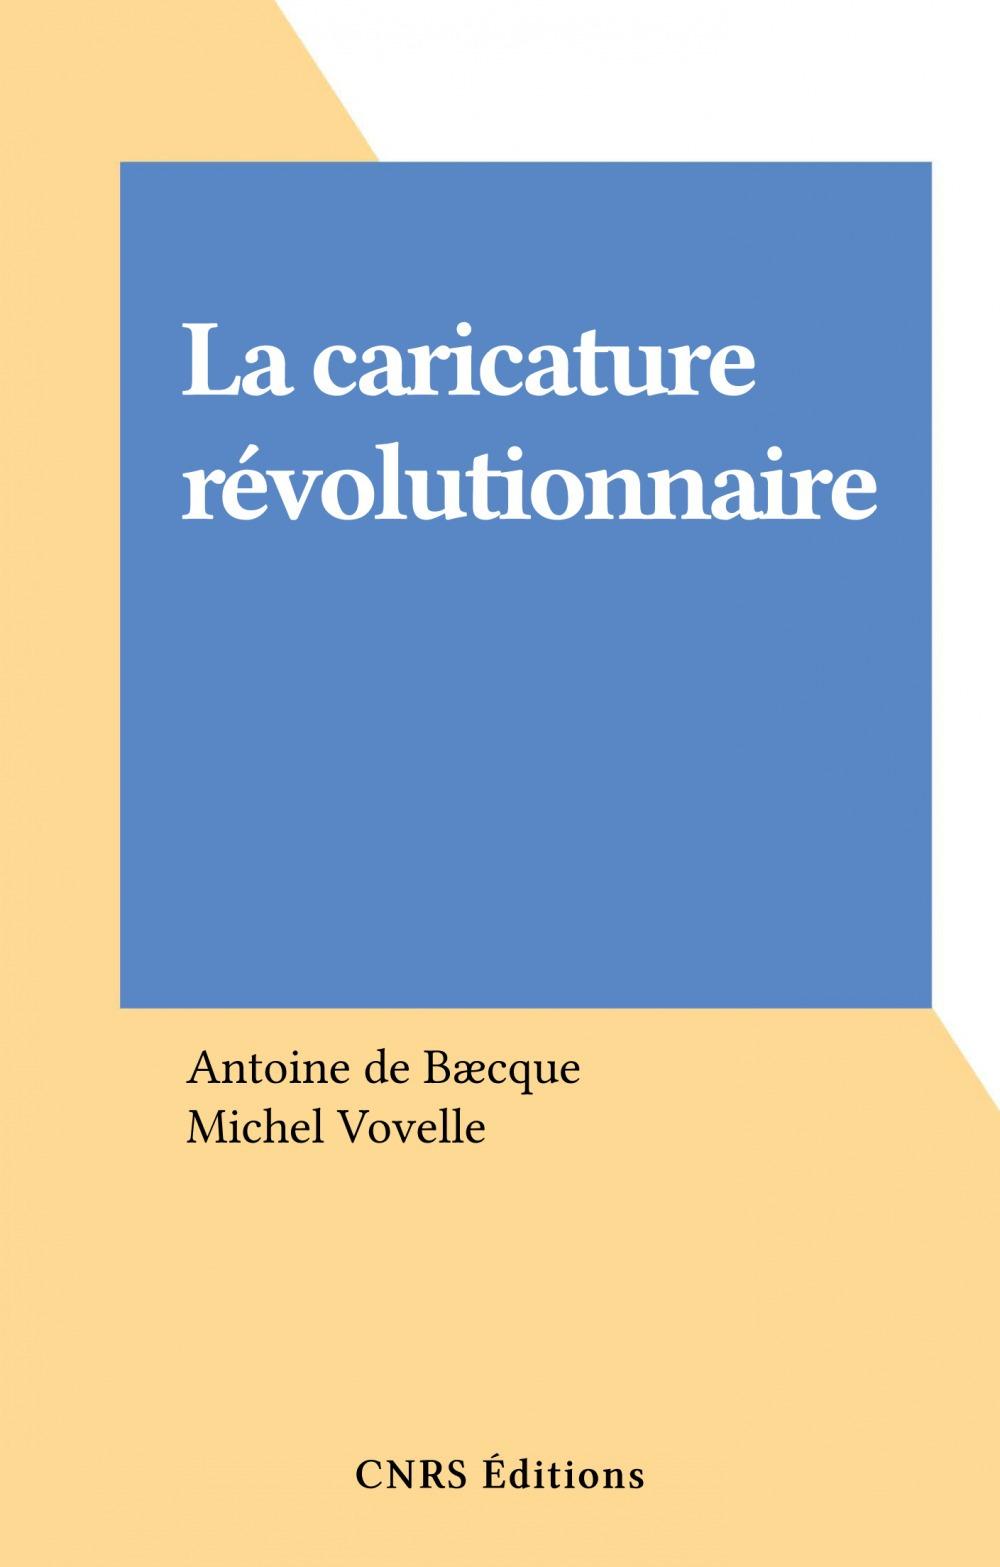 La caricature revolutionnaire - 1 volume